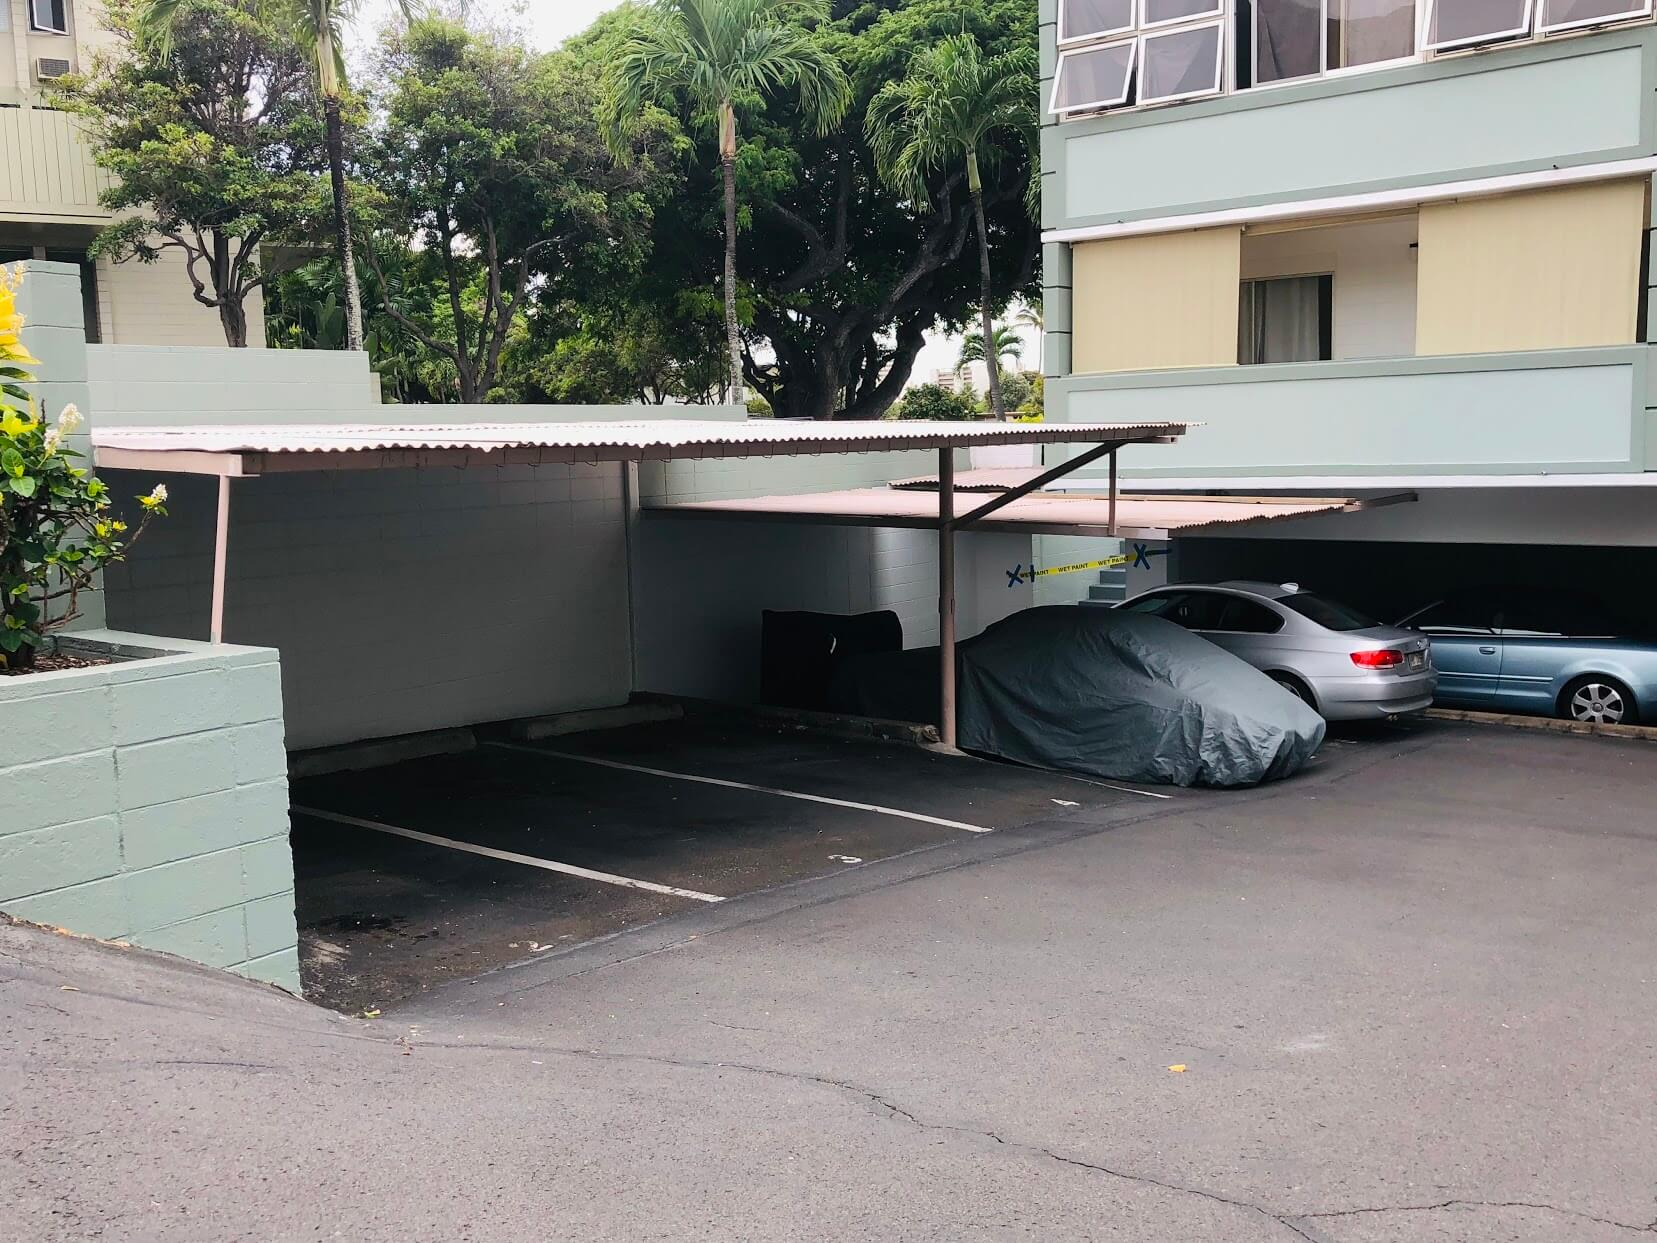 Hale Pua Leiの駐車場